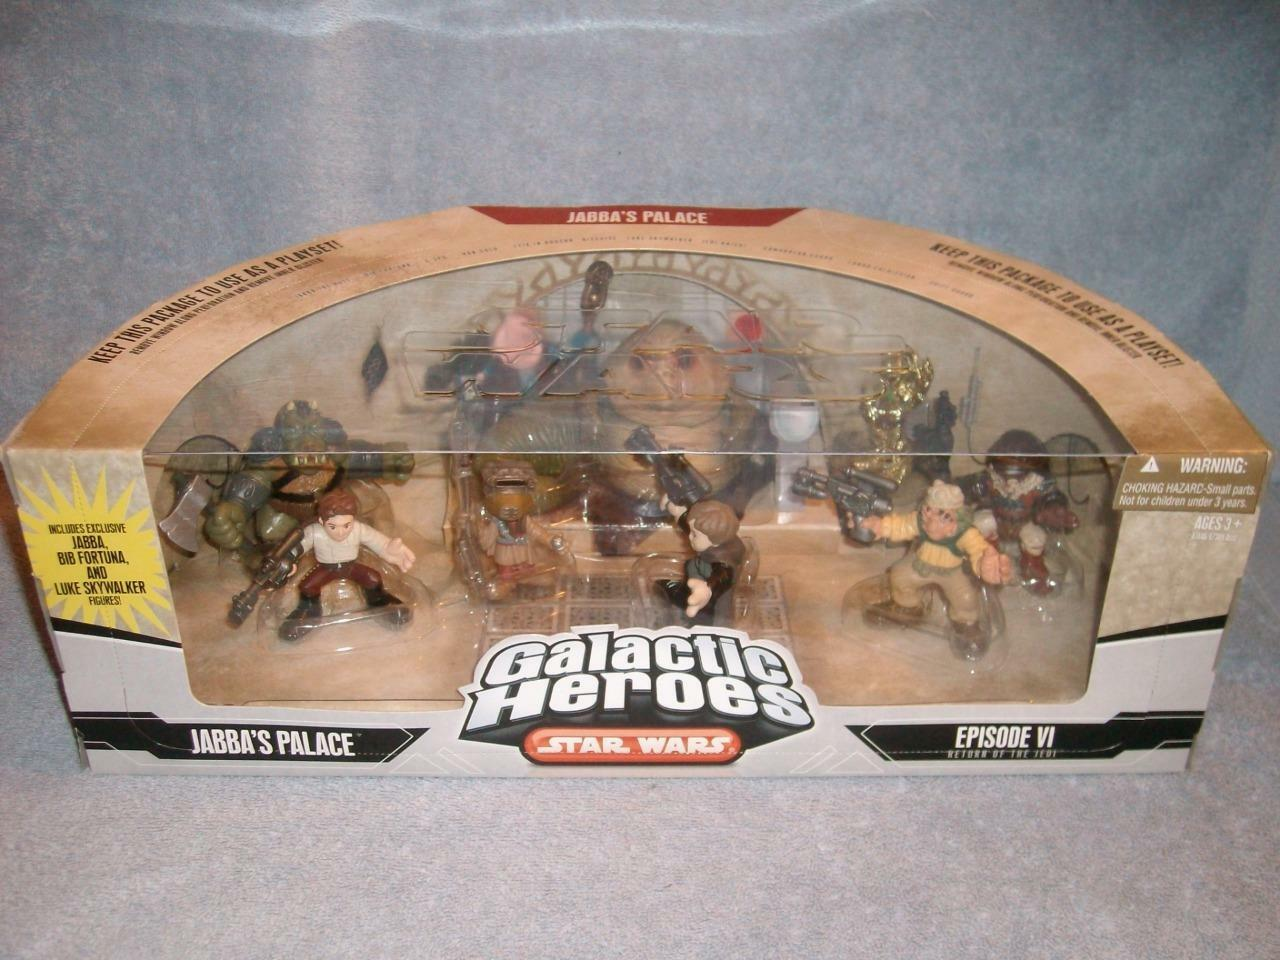 Jabbas Palace Galactic Heroes Exclusive Luke Bib Fortuna Star Wars Hasbro 2007